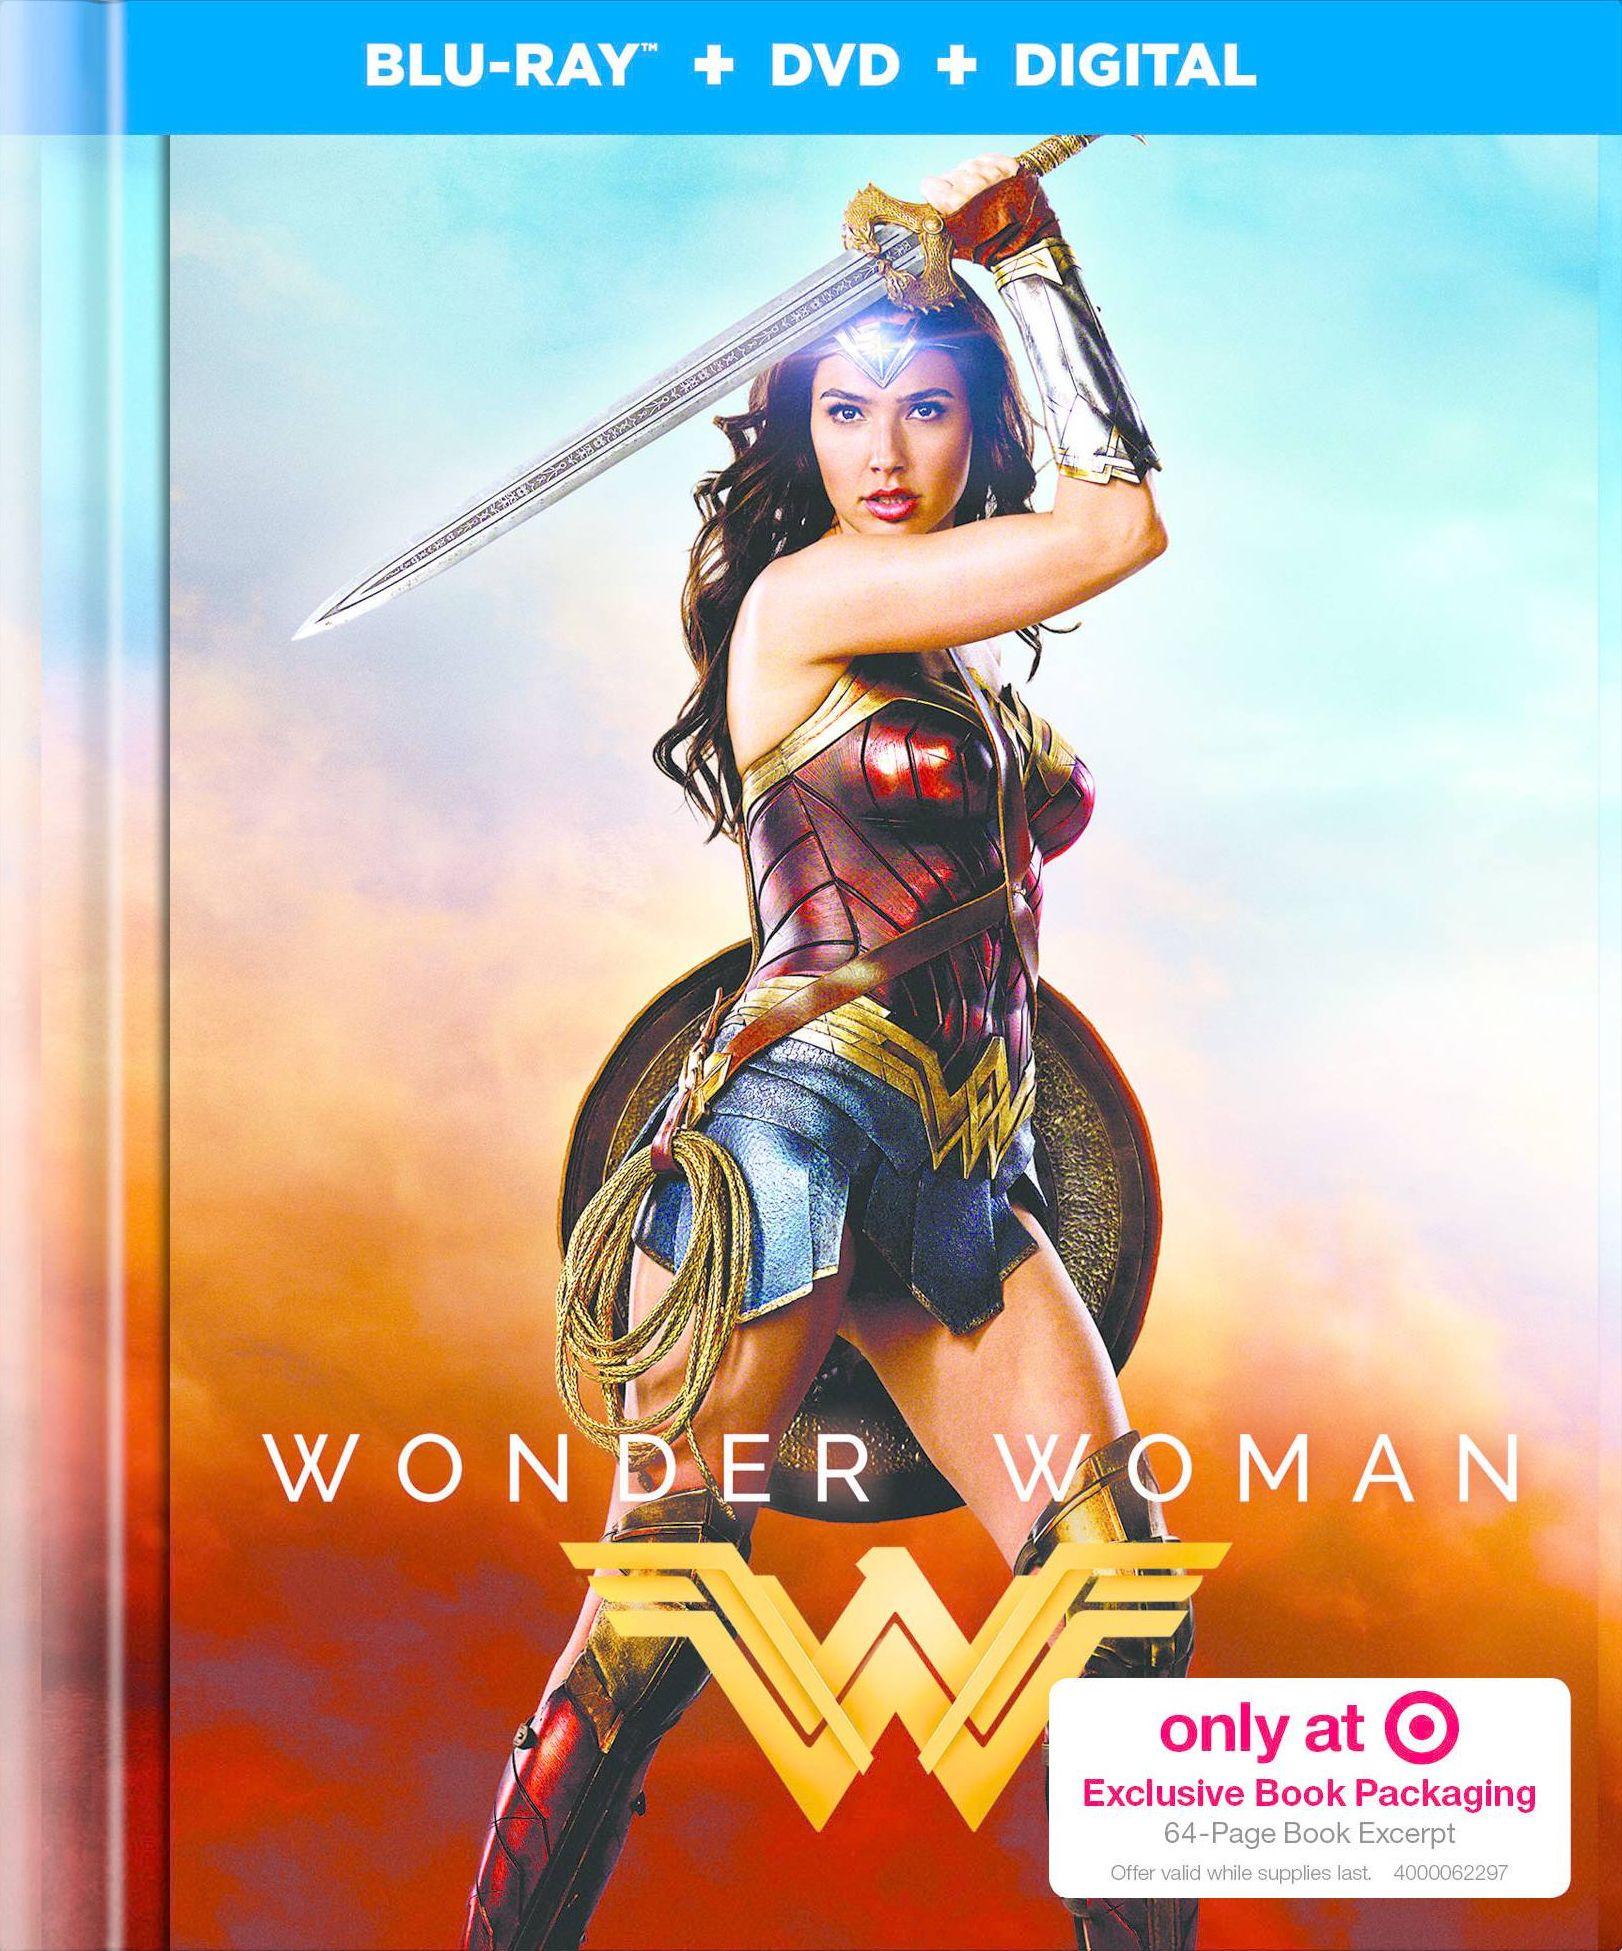 Wonder Woman Target Exclusive Blu Ray Digibook Warner Wonder Woman 2017 Poster Wonder Woman Movie Wonder Woman